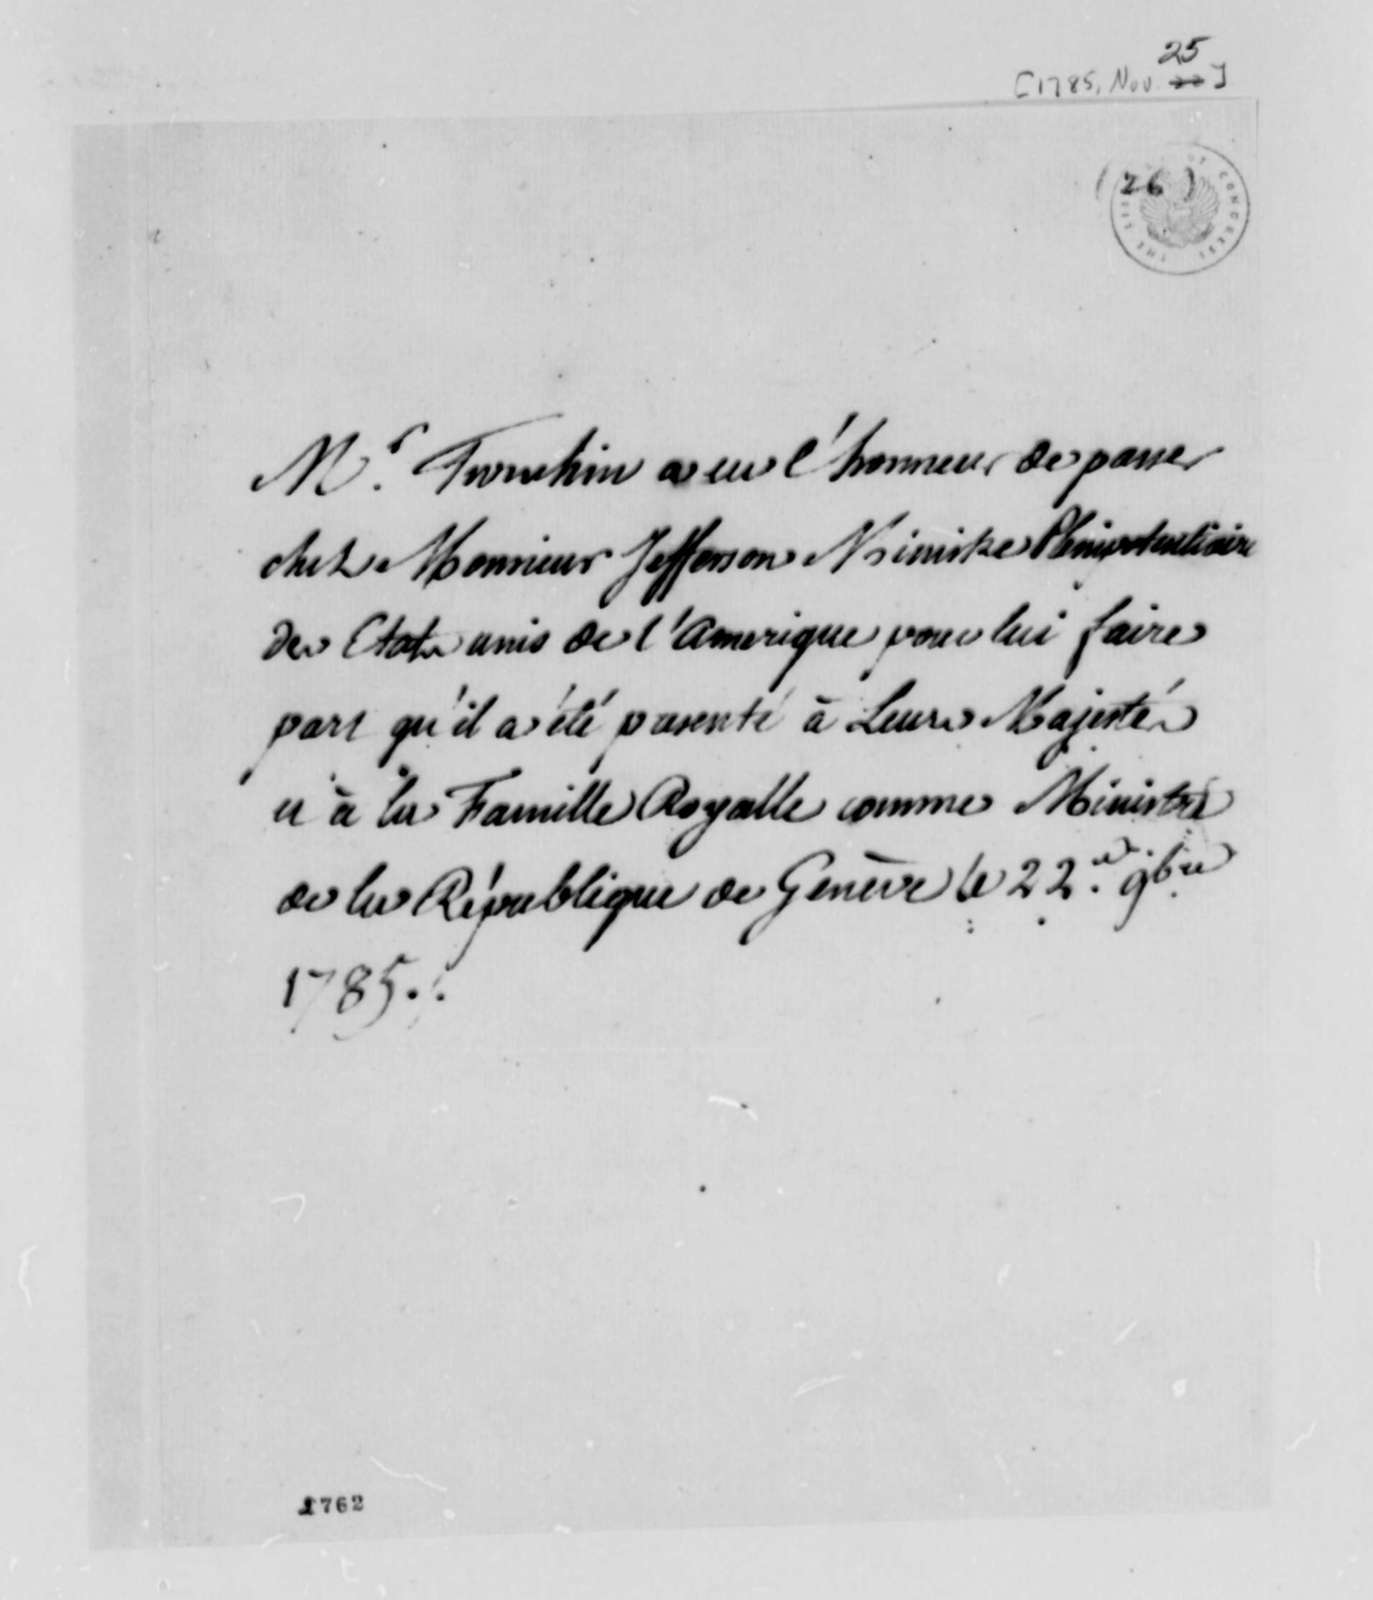 Jean-Armand Tronchin to Thomas Jefferson, November 25, 1785, in French